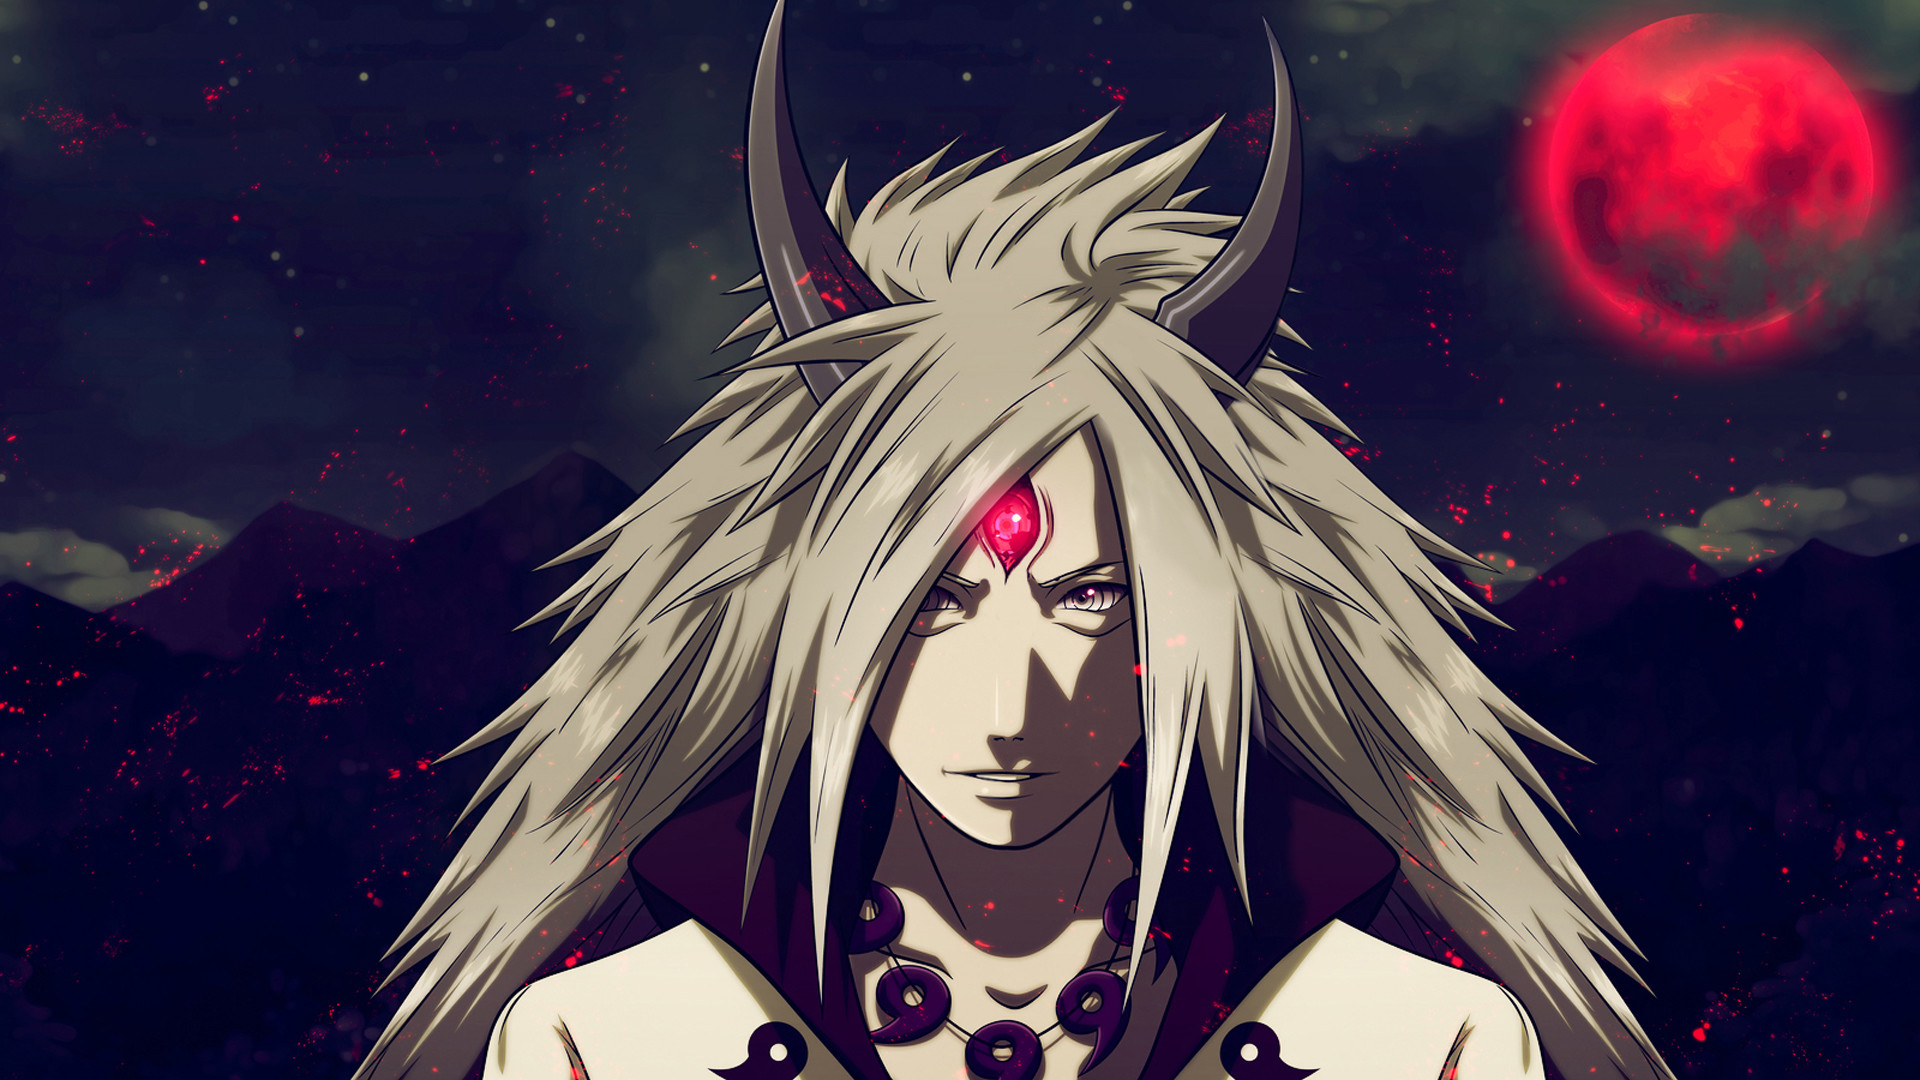 Anime – Naruto Sage of Six Paths Madara Uchiha Wallpaper